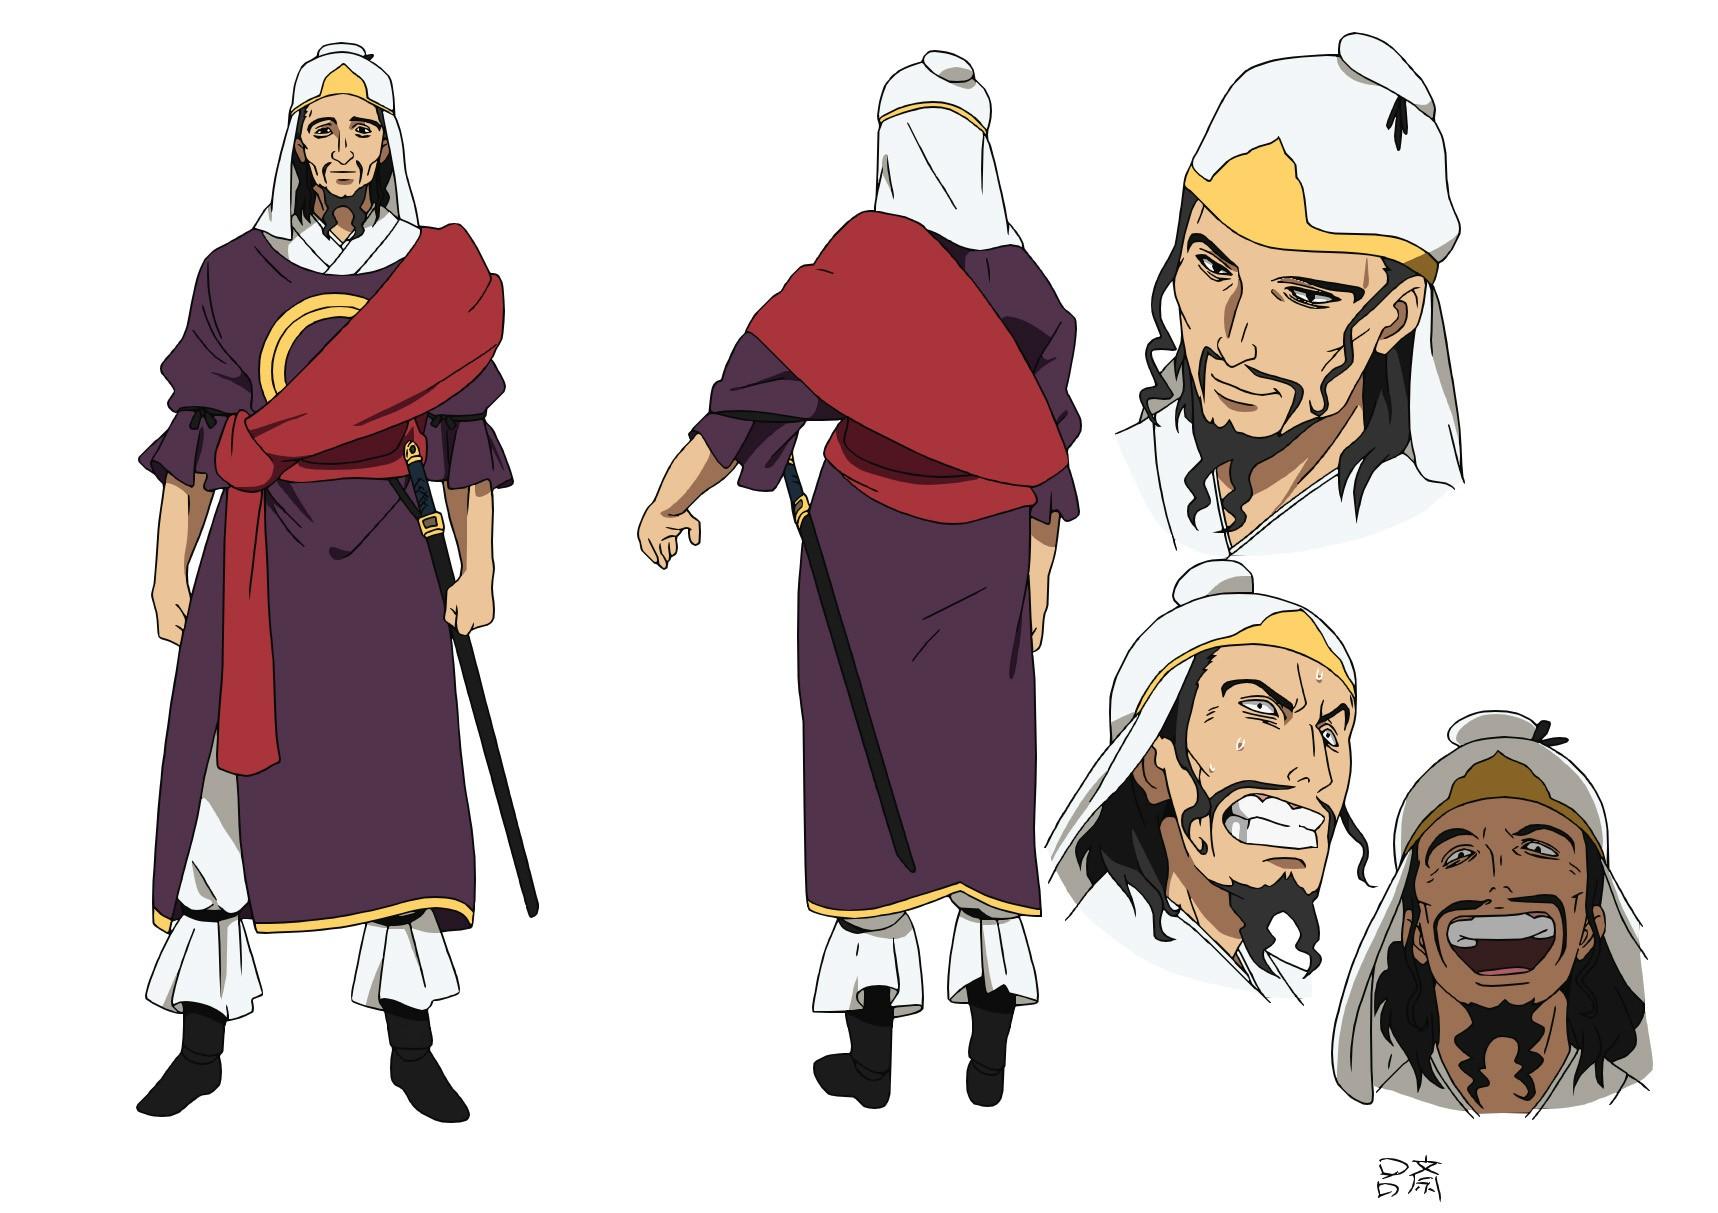 Character Design Wiki : Image ryosai character design magi wiki fandom